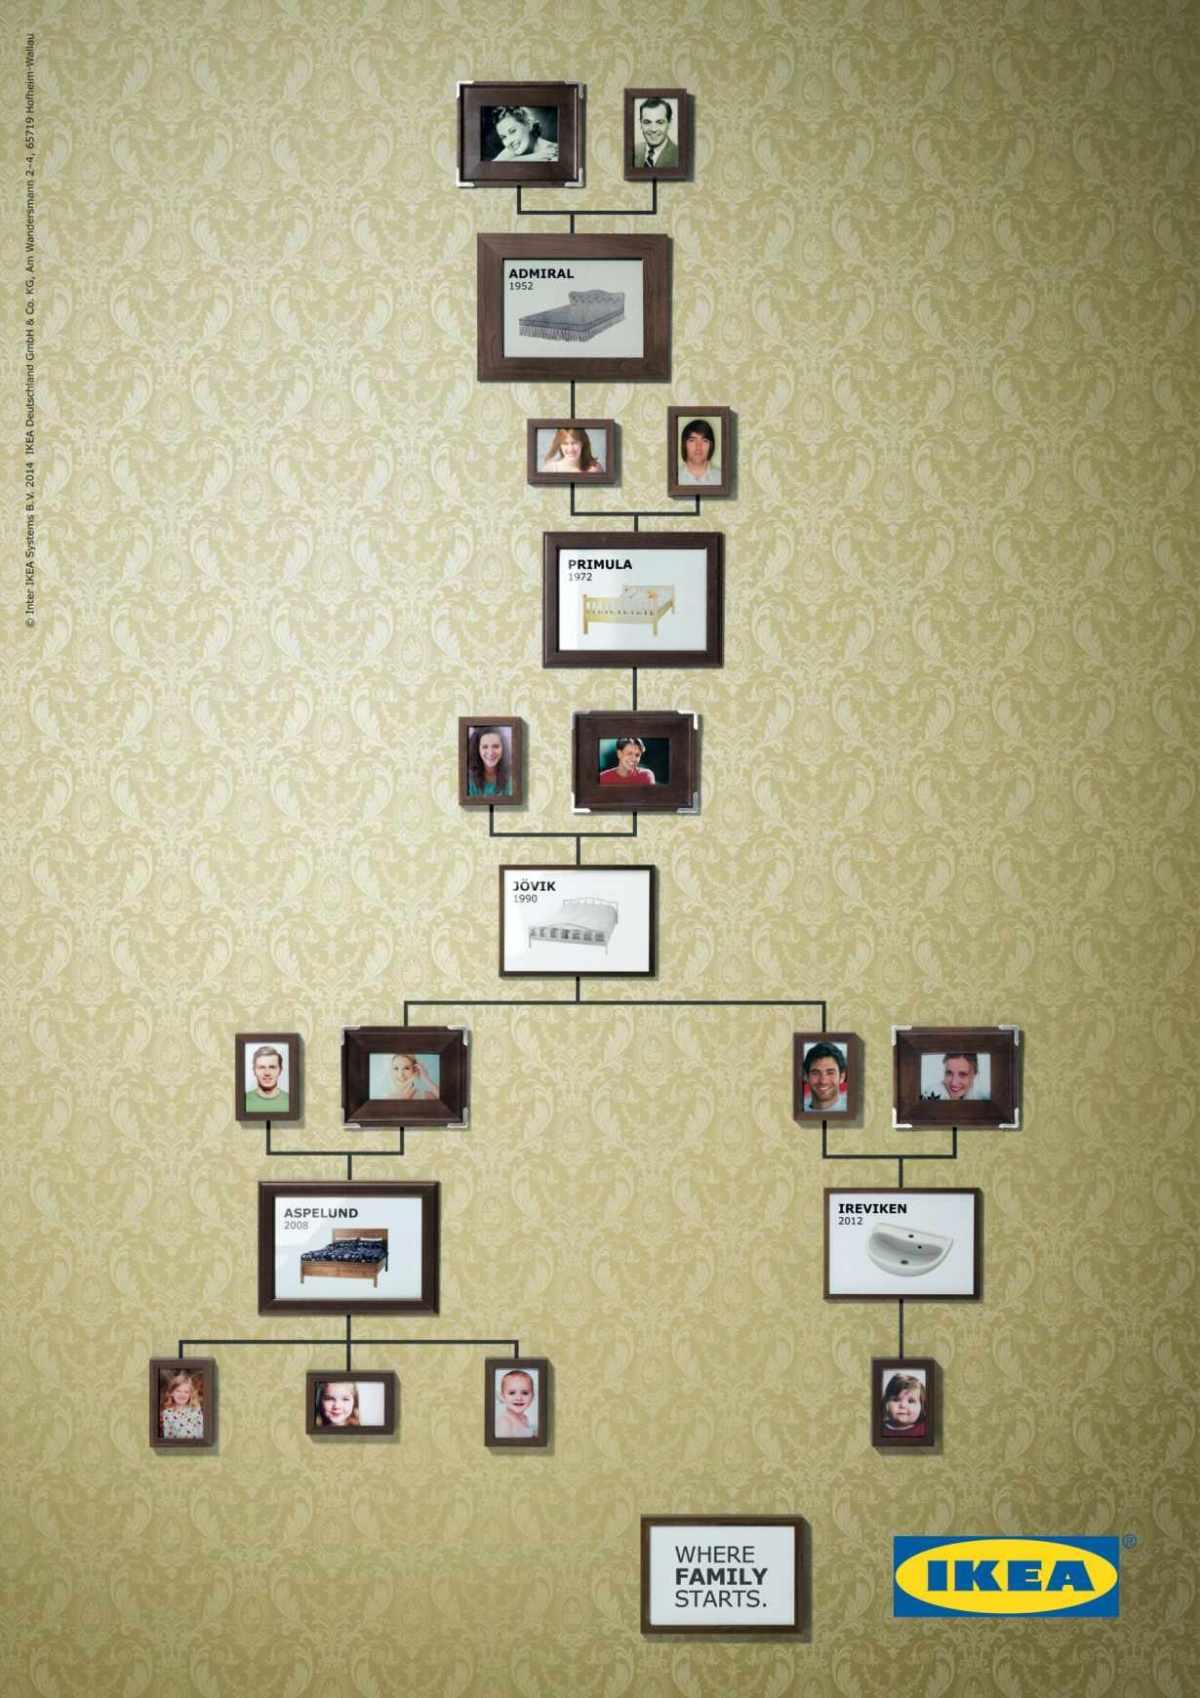 ikea_family_tree-02-sink_aotw